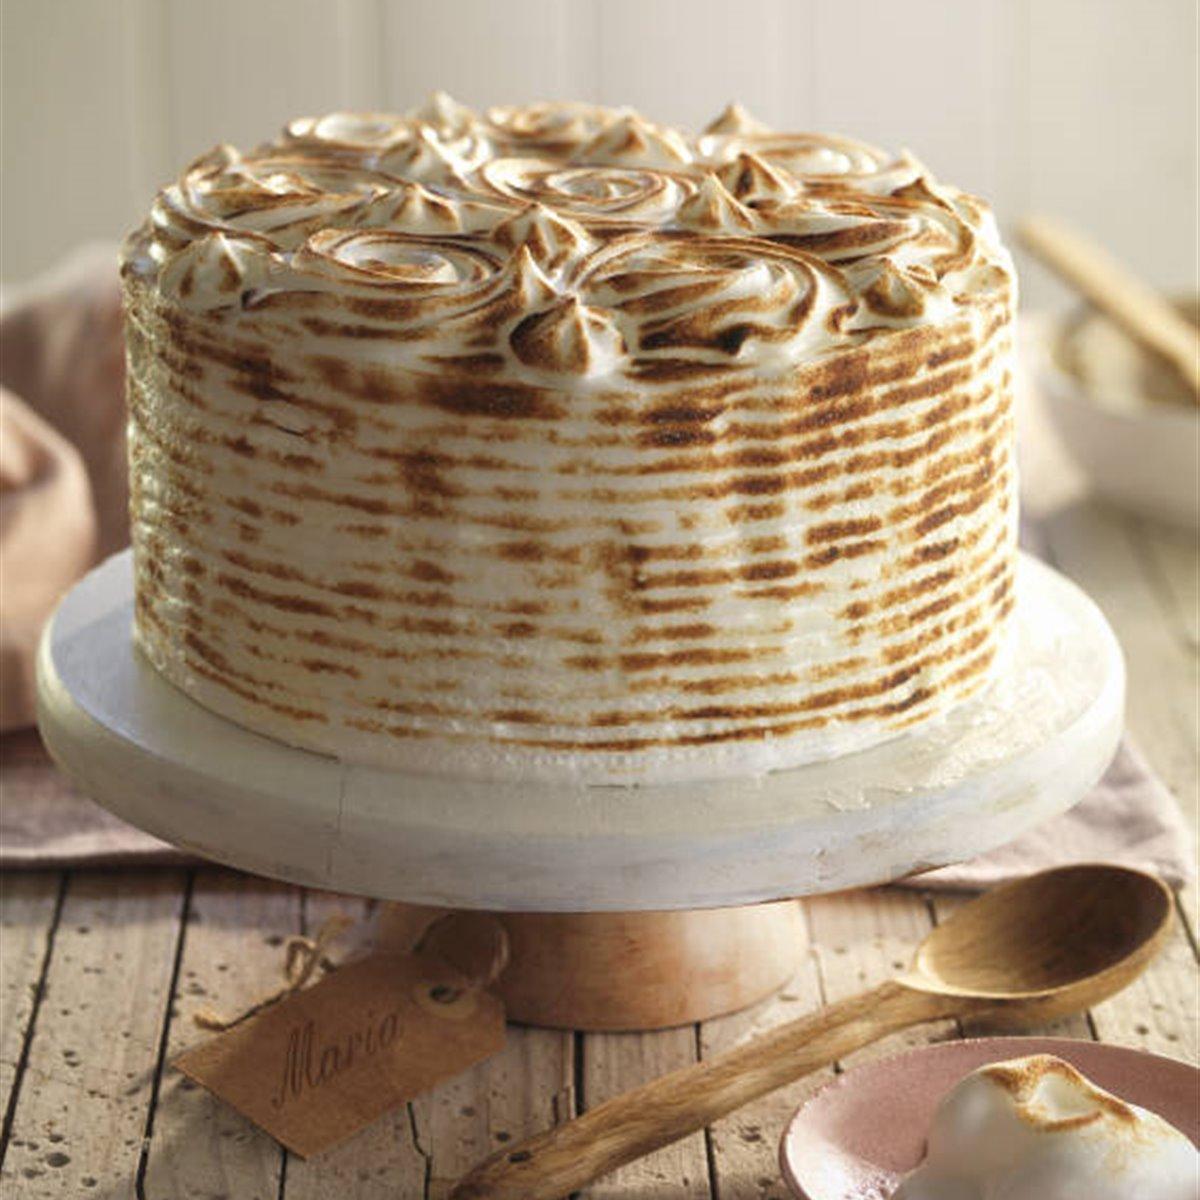 Bizcocho con cobertura de merengue tostado en dos texturas